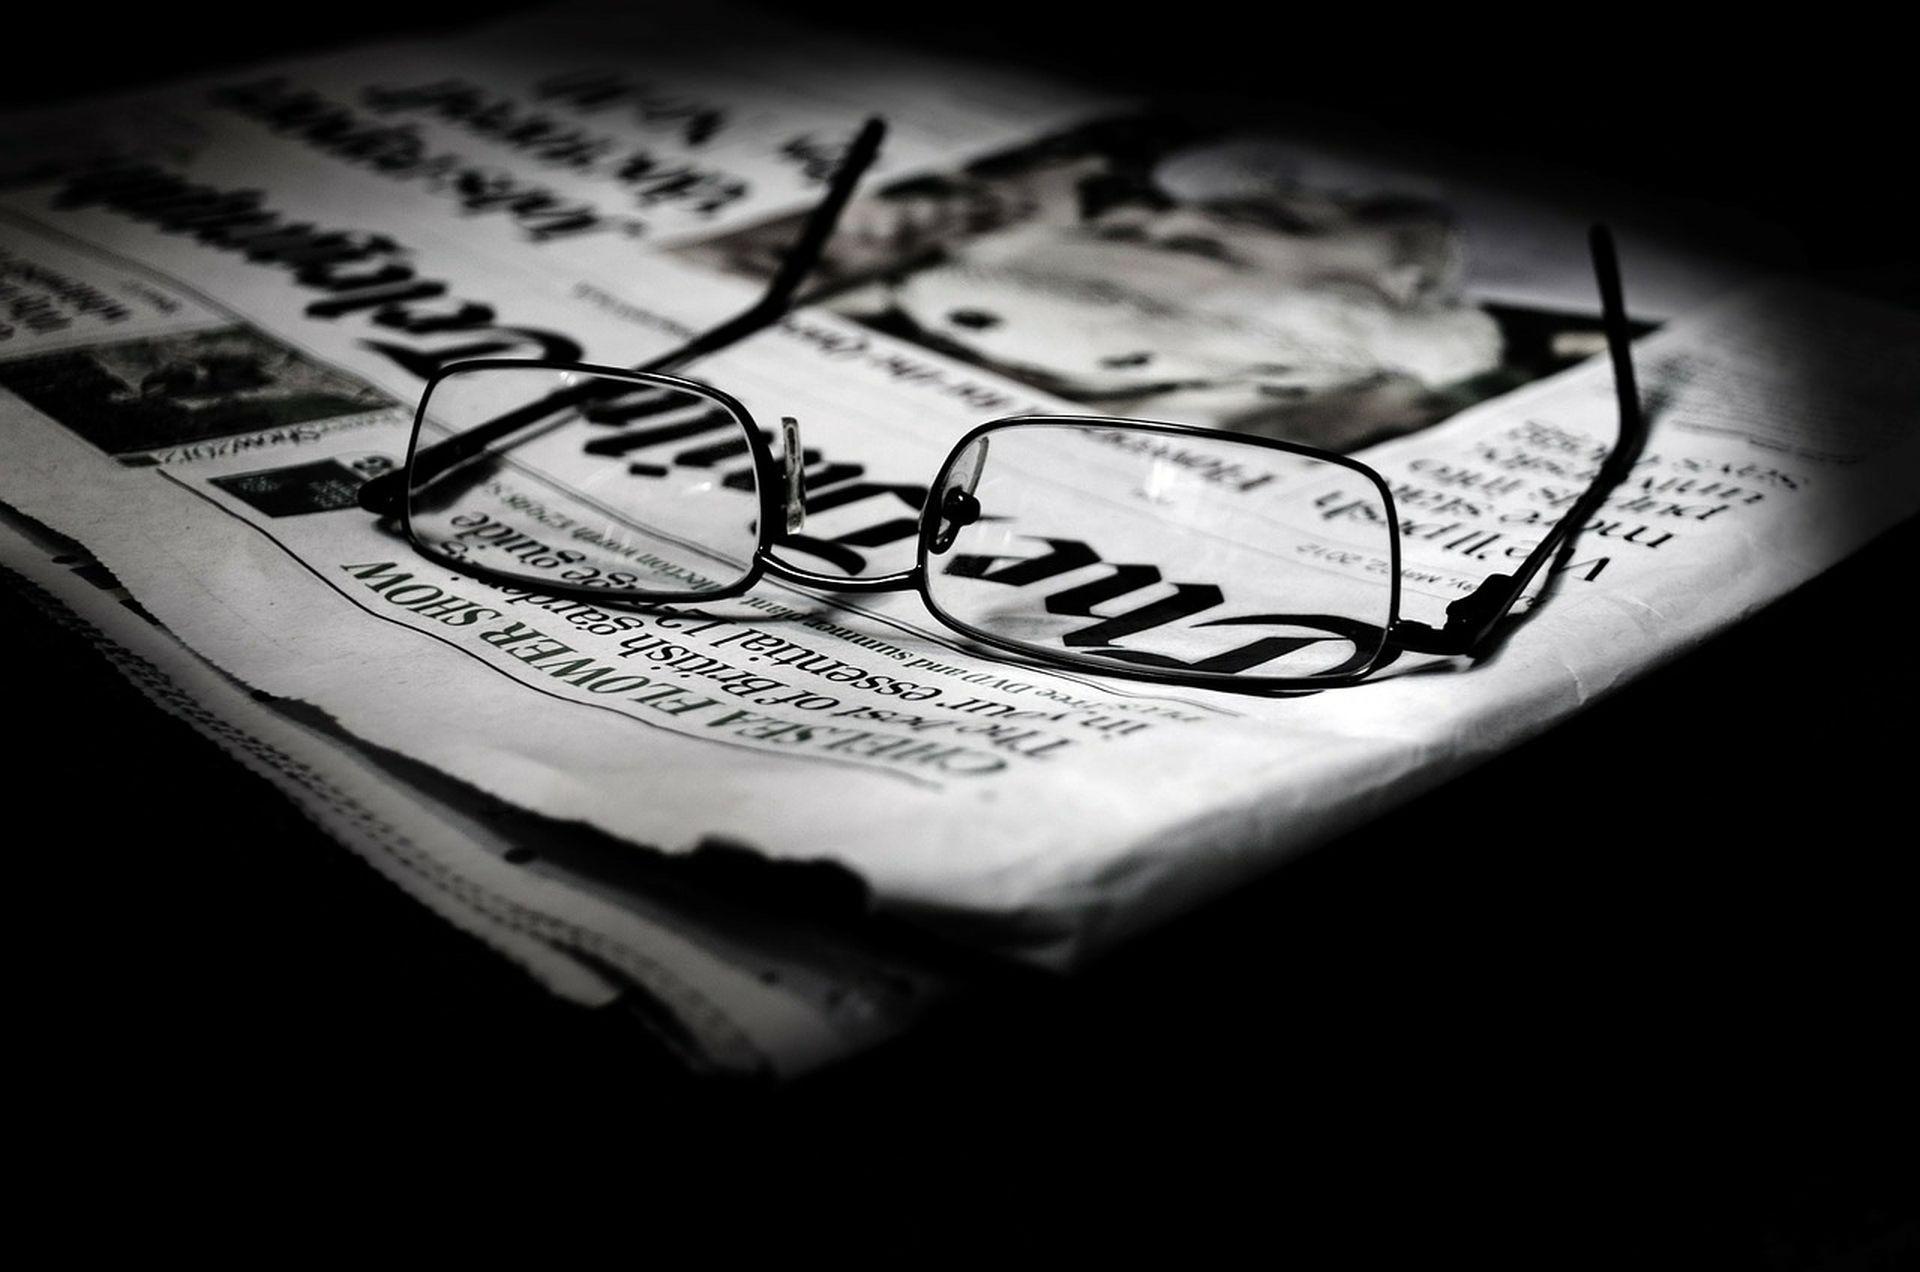 V Ukraїni zapustyly cyfrovyj rejtyng žurnalistiv ta ekspertiv